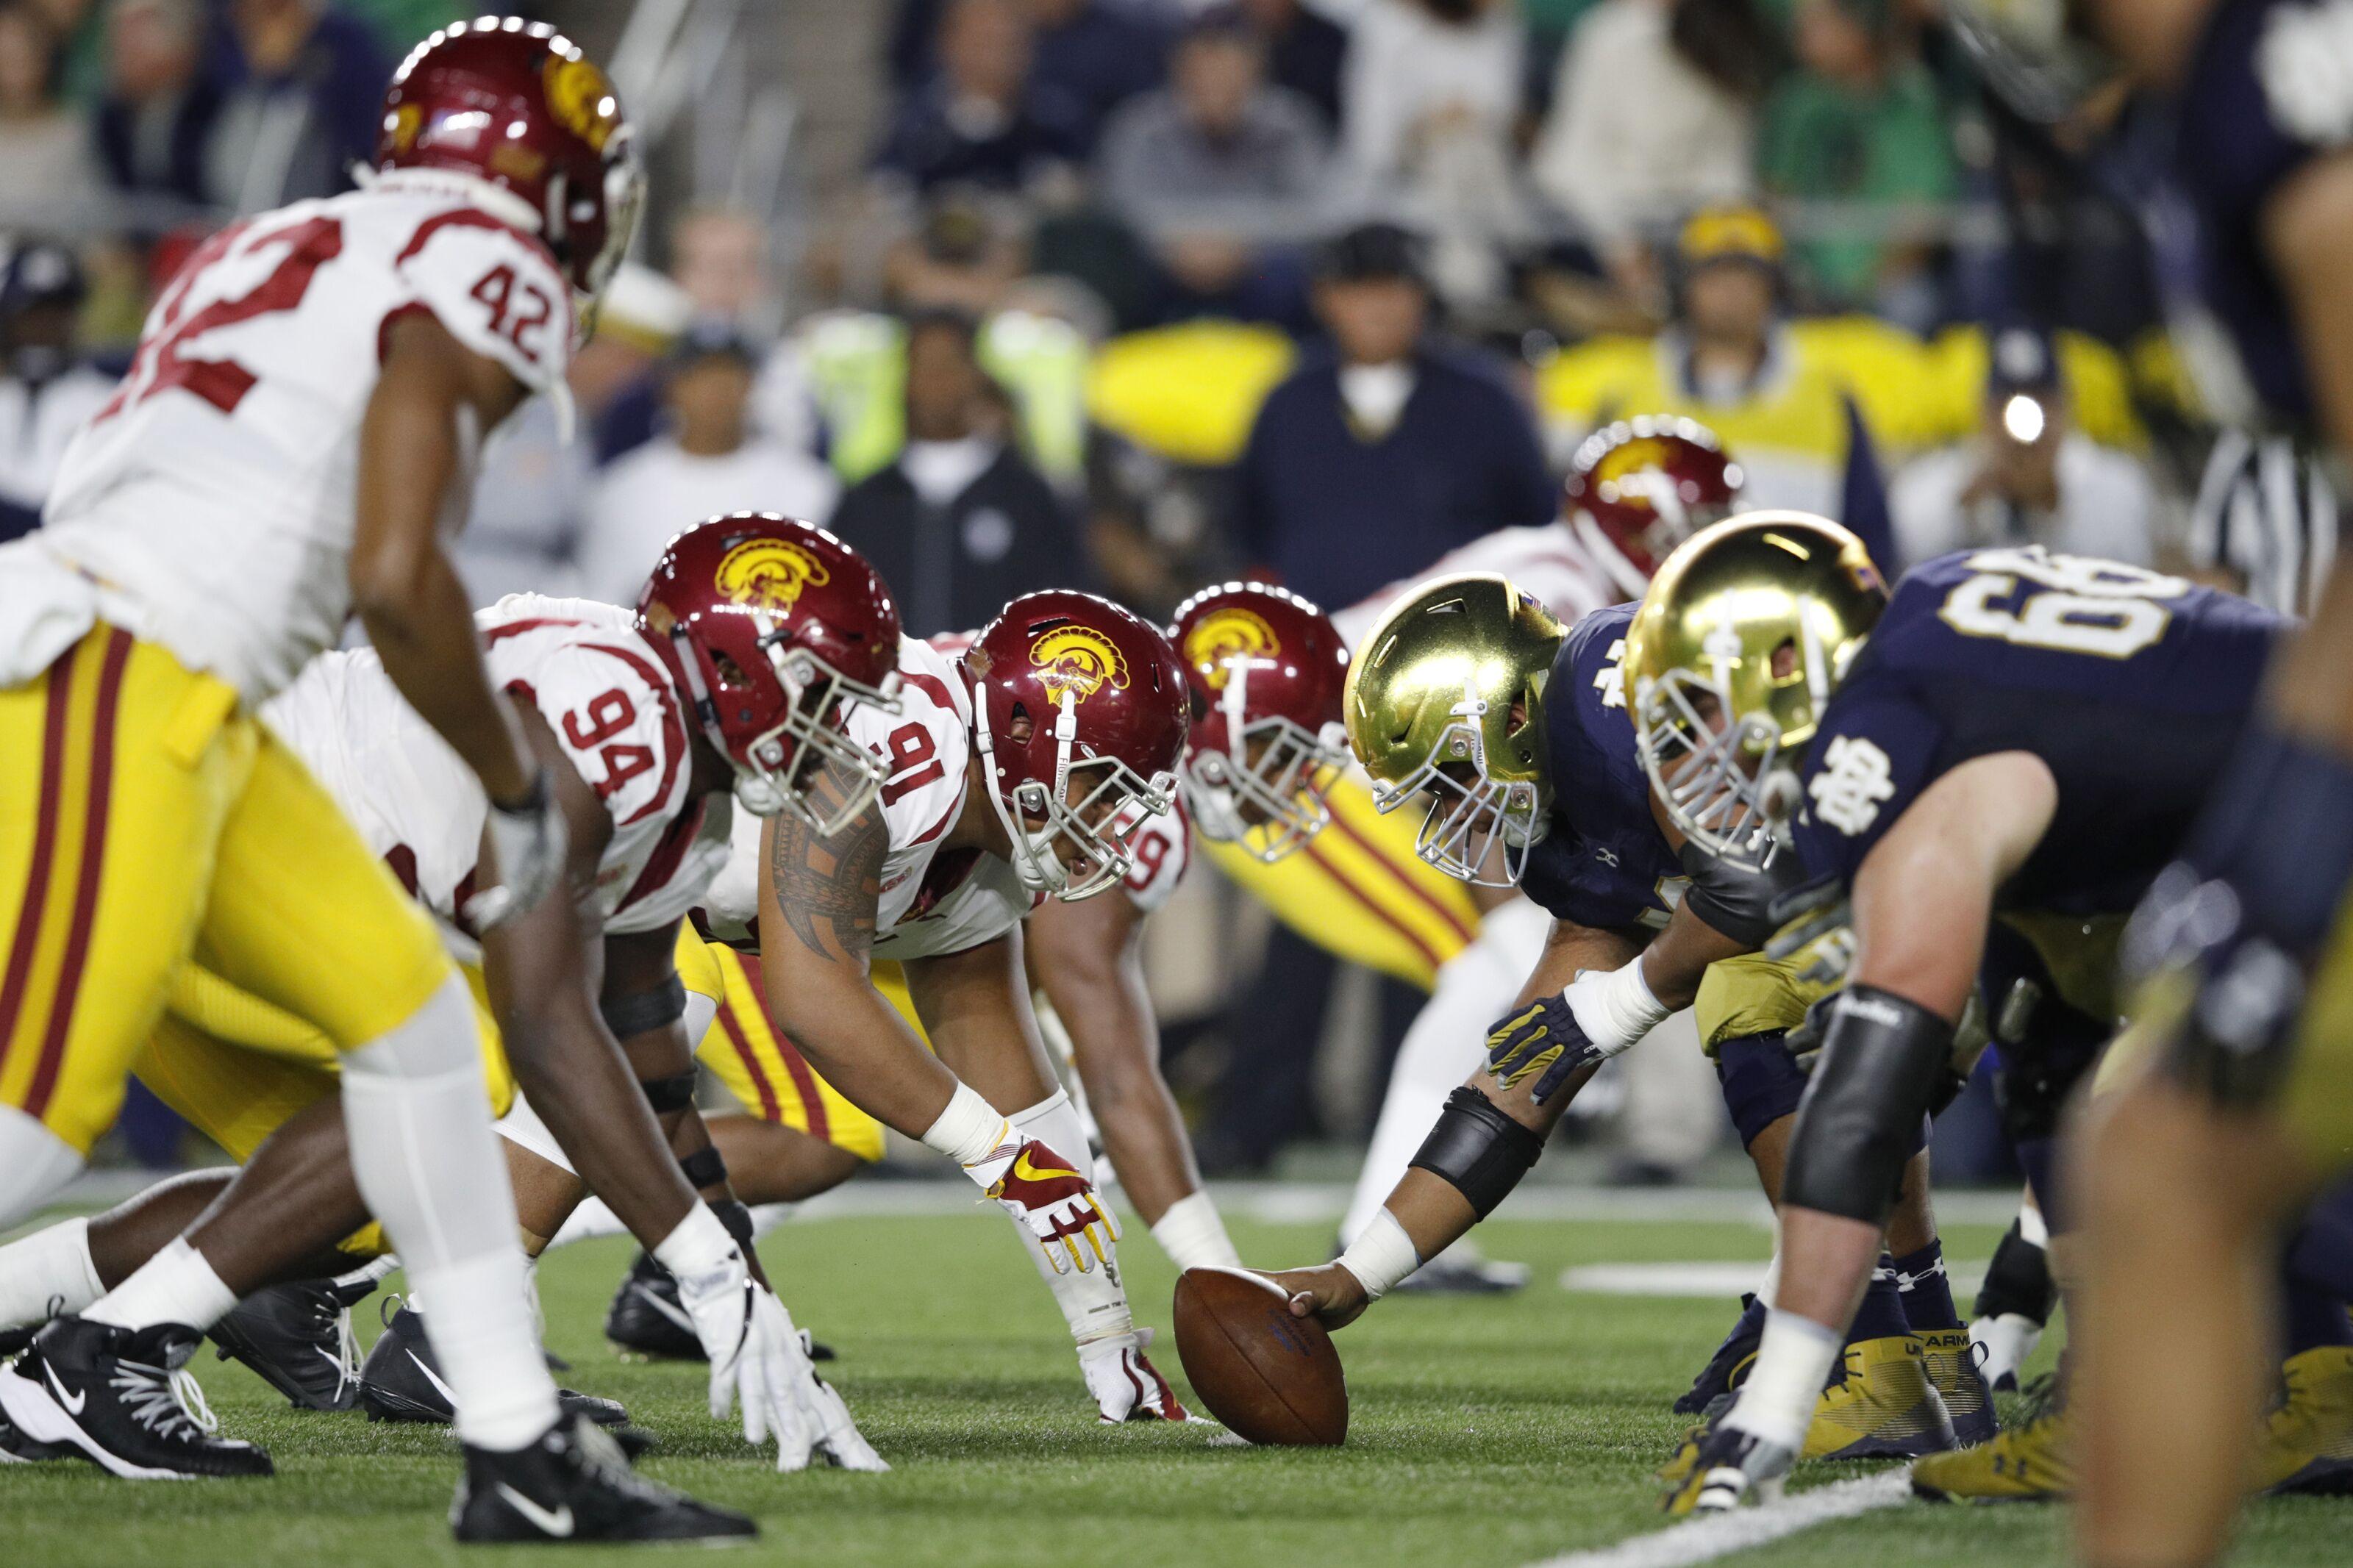 football college rivalry games getty fan